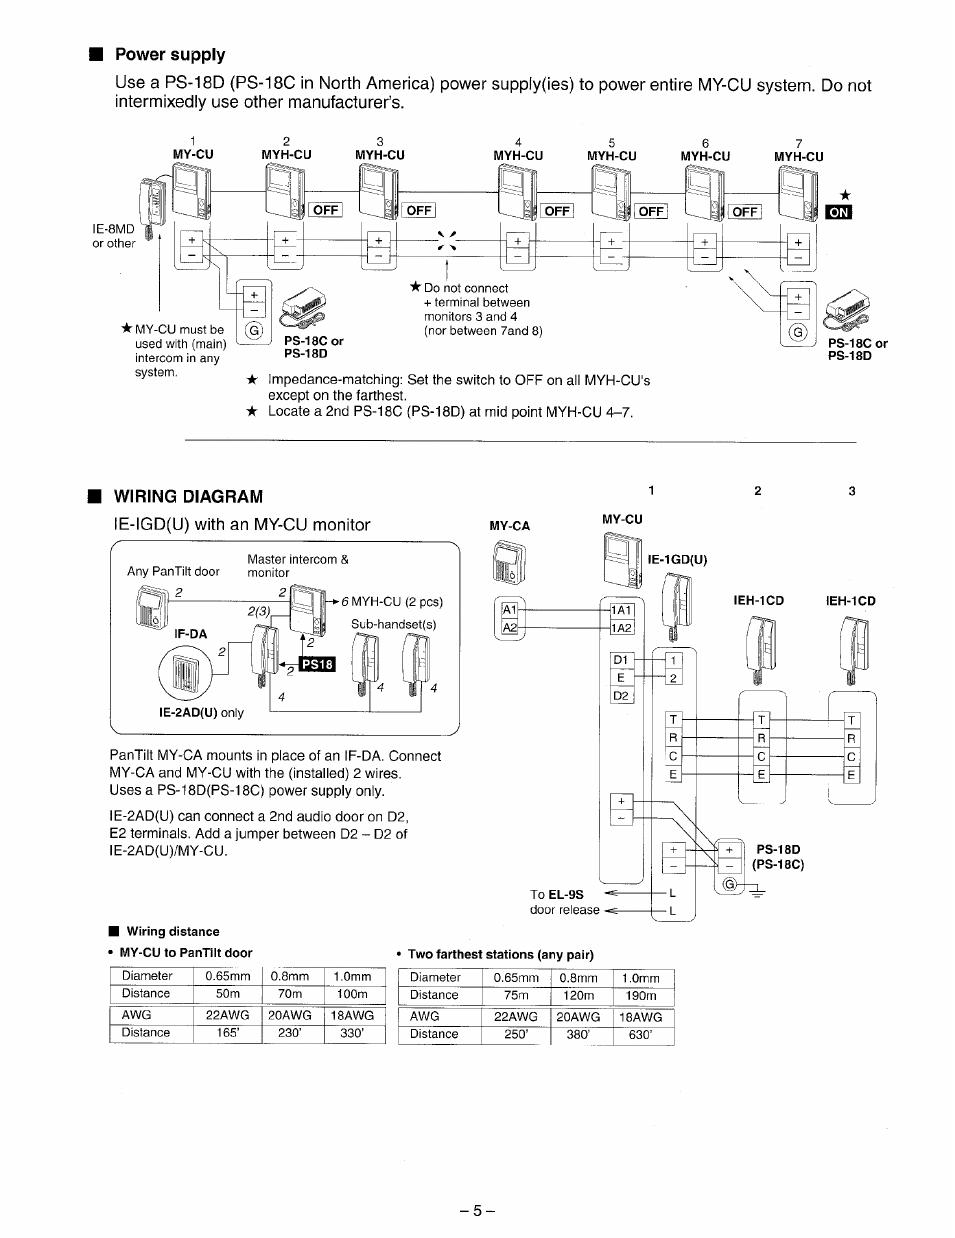 aiphone td 6h wiring diagram aiphone lef 3 wiring diagram